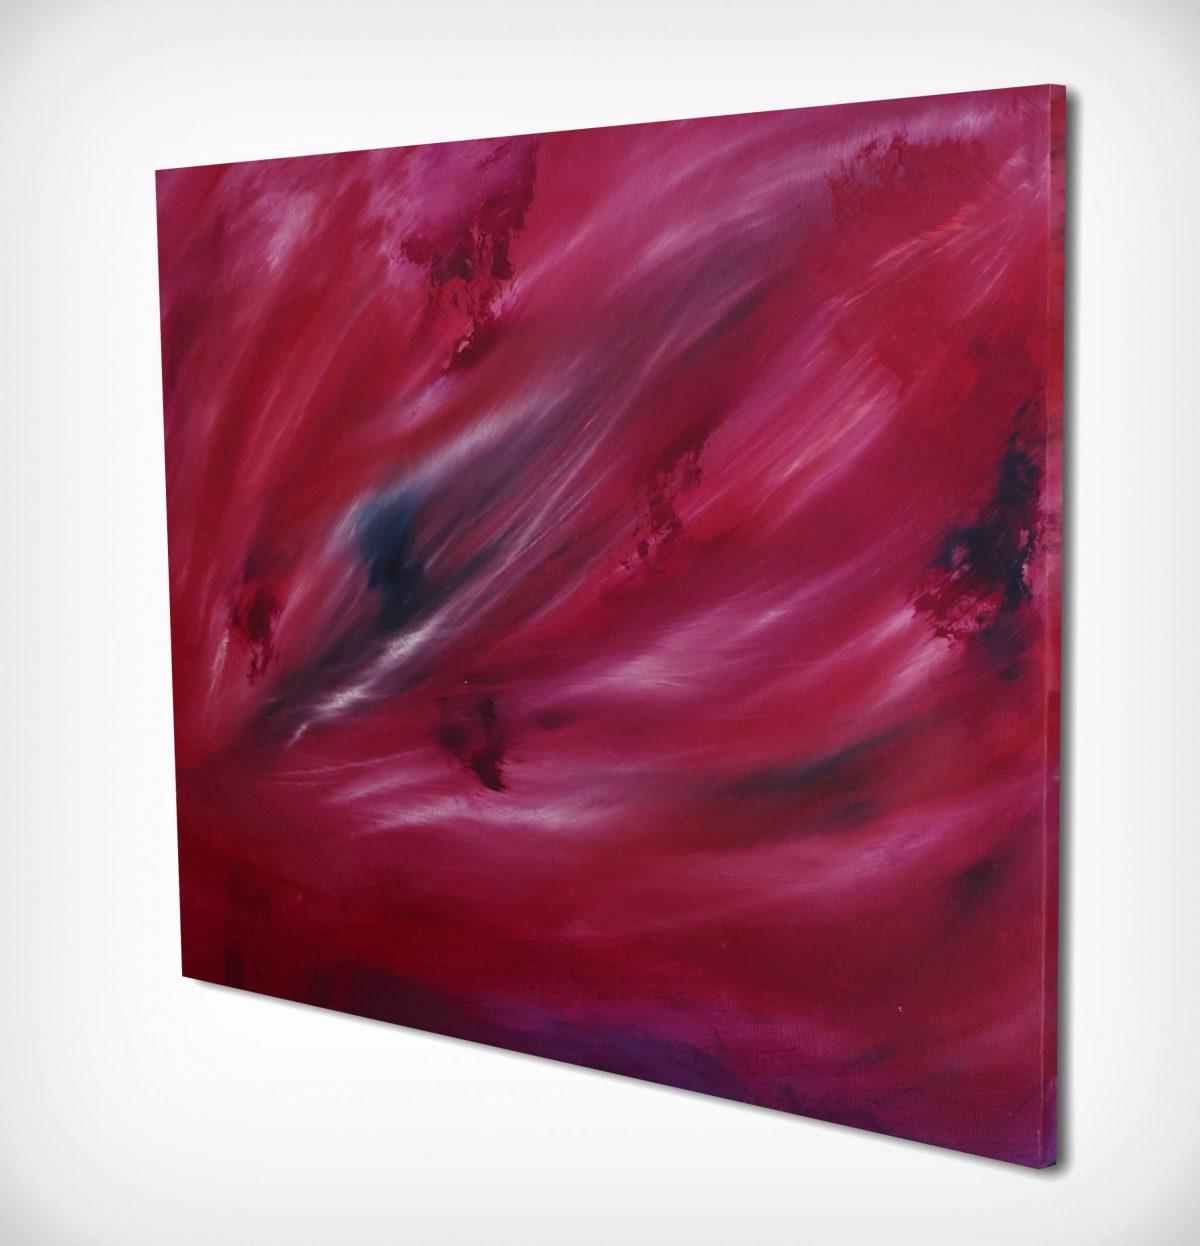 cielo ferito dipinto astratto moderno in vendita online